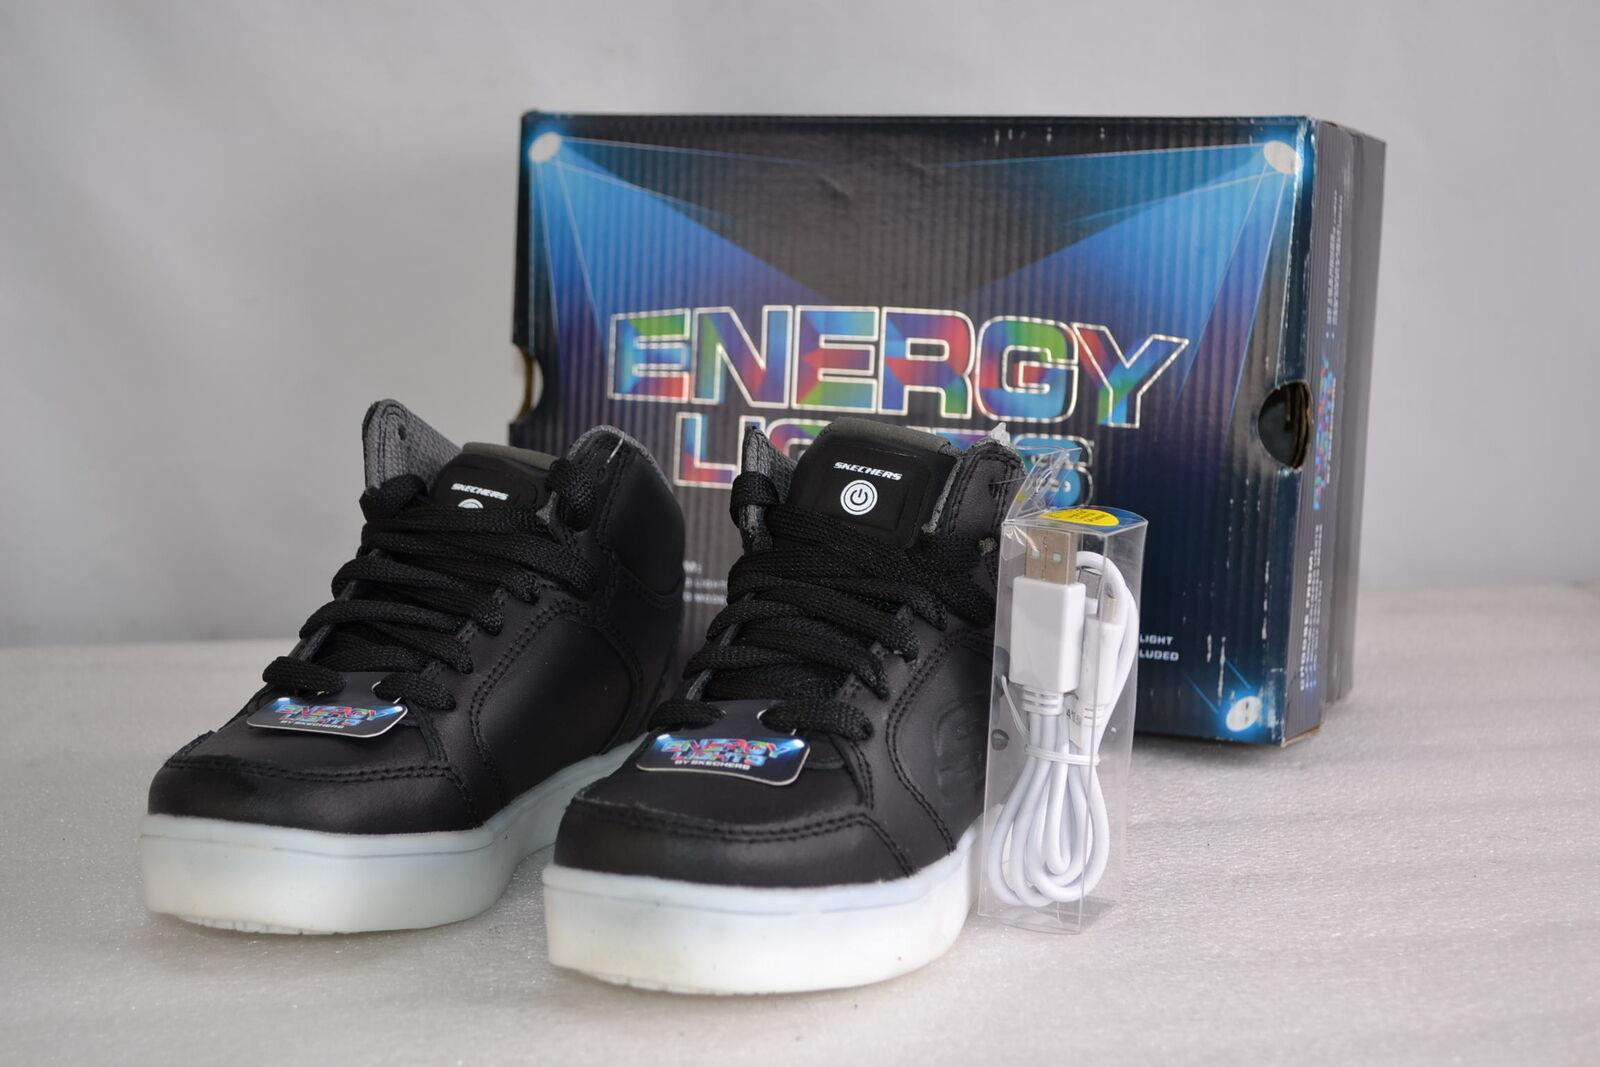 00114591d44f Skechers Energy Lights Boys Sneaker Hi Top Black Youth Sizes 90600l ...